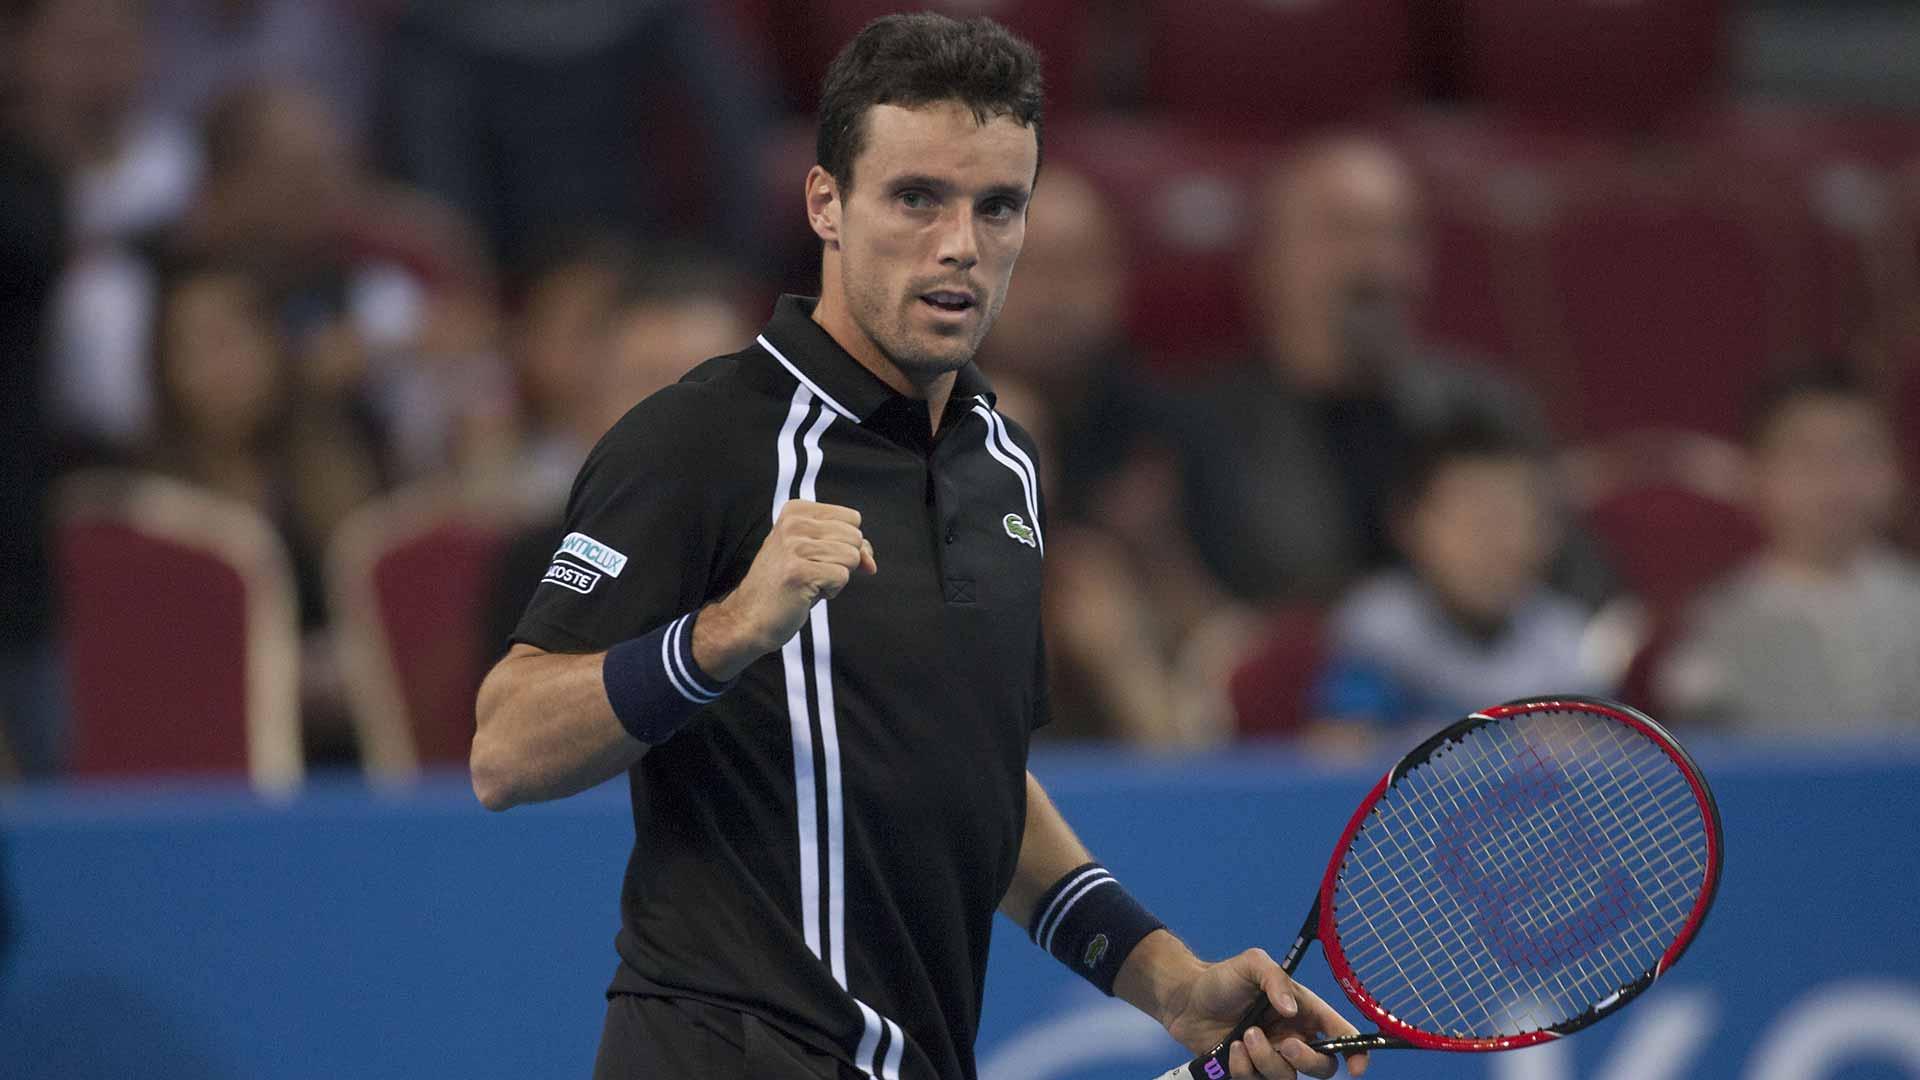 「Roberto Bautista Agut atp tennis」的圖片搜尋結果